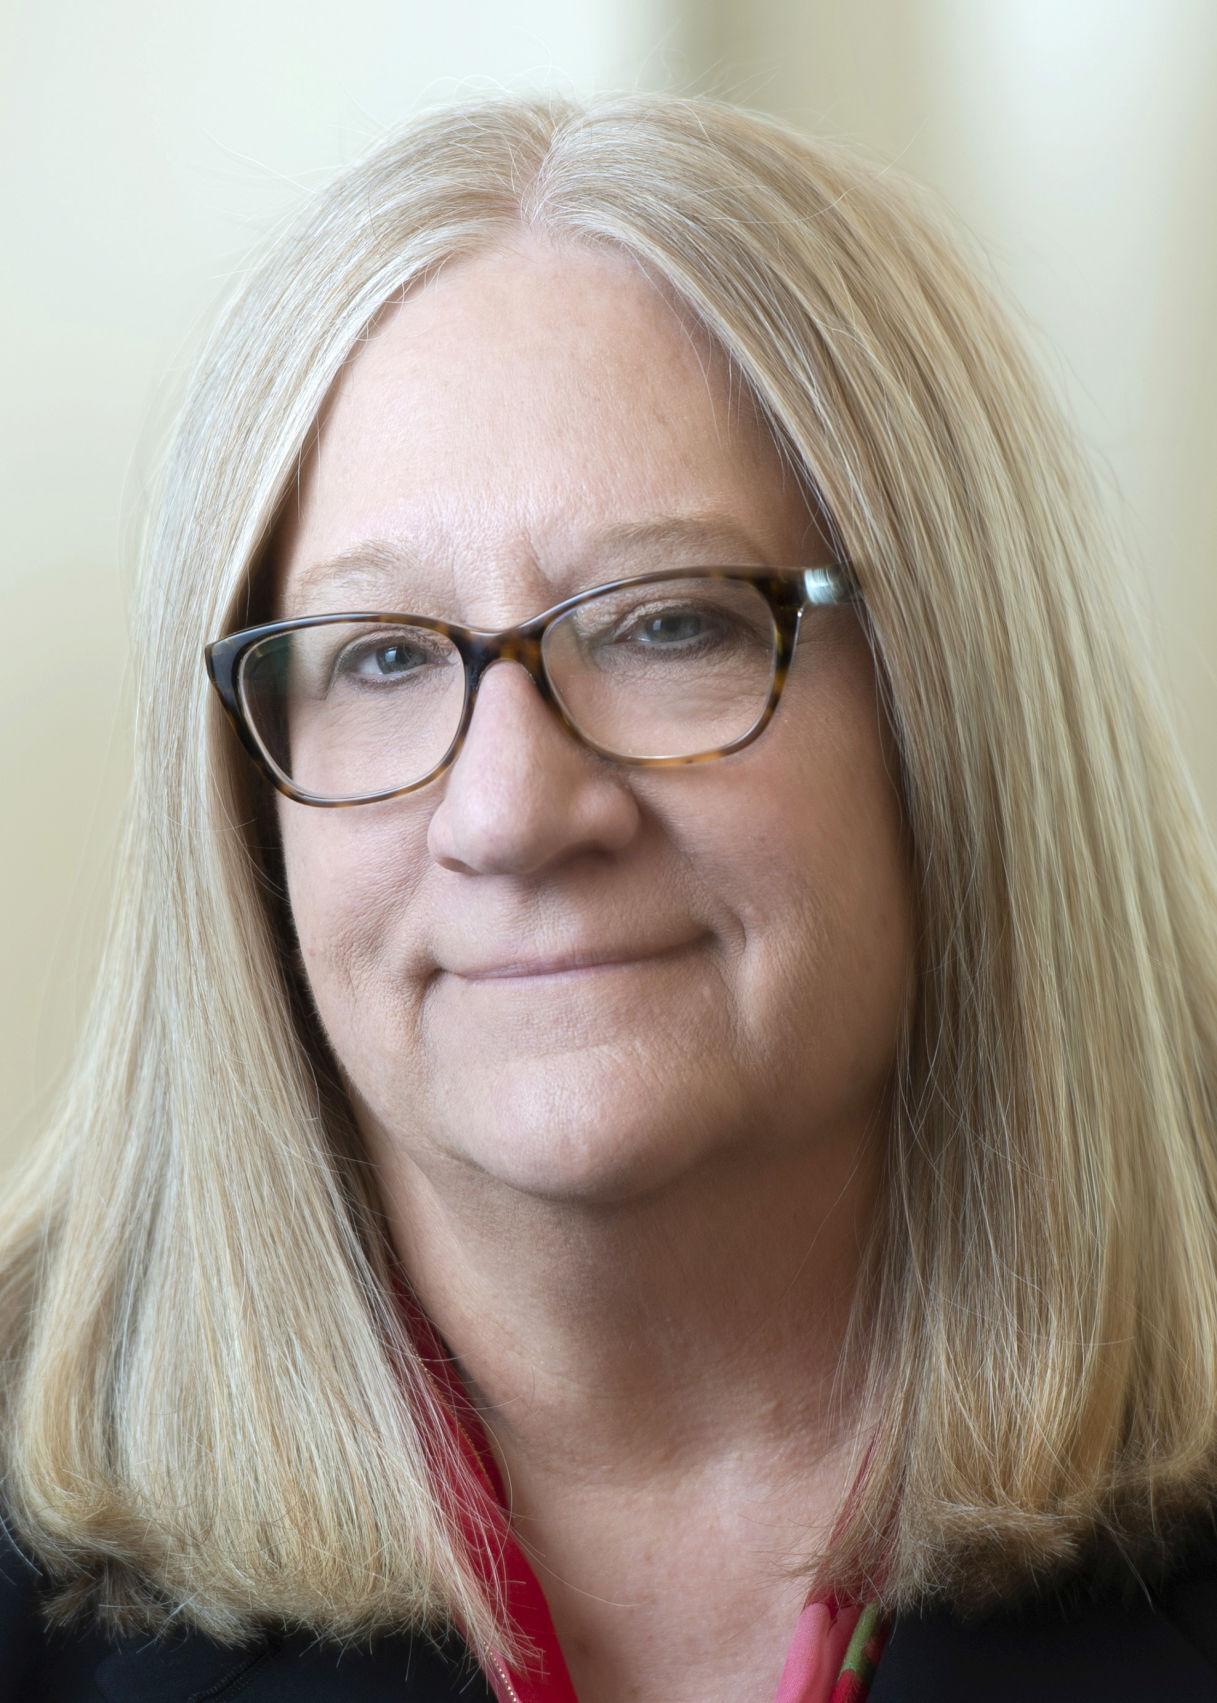 Sue Abderholden